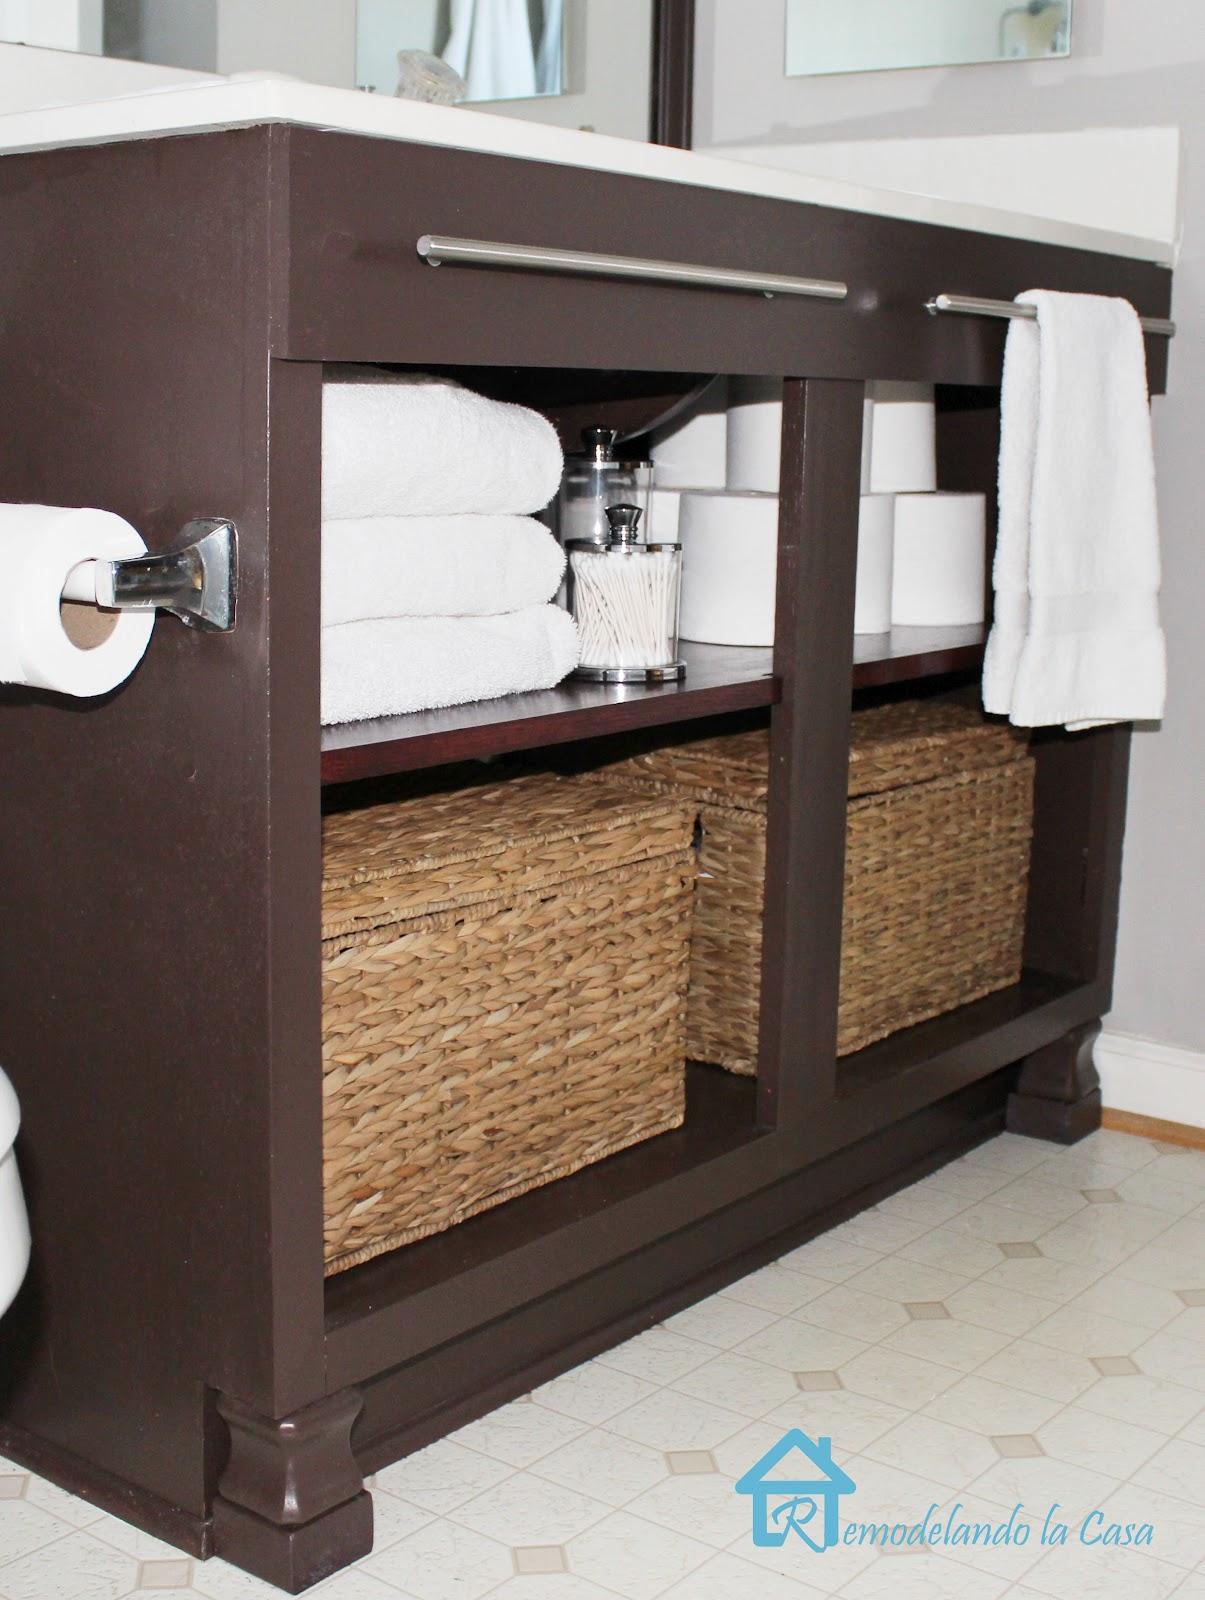 Homemade Kitchen Sink Cabinets